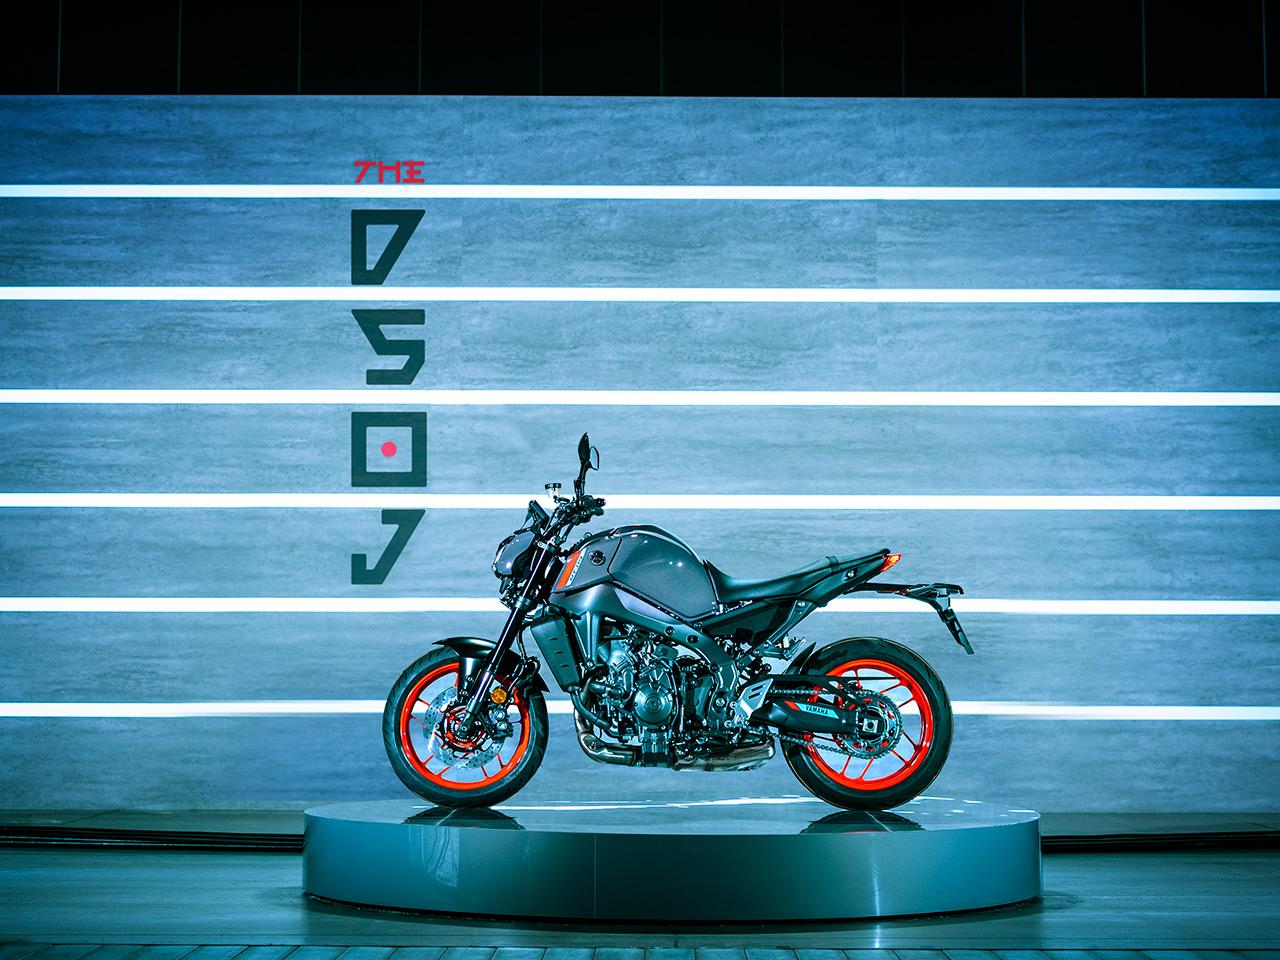 2021 Yamaha MT 09